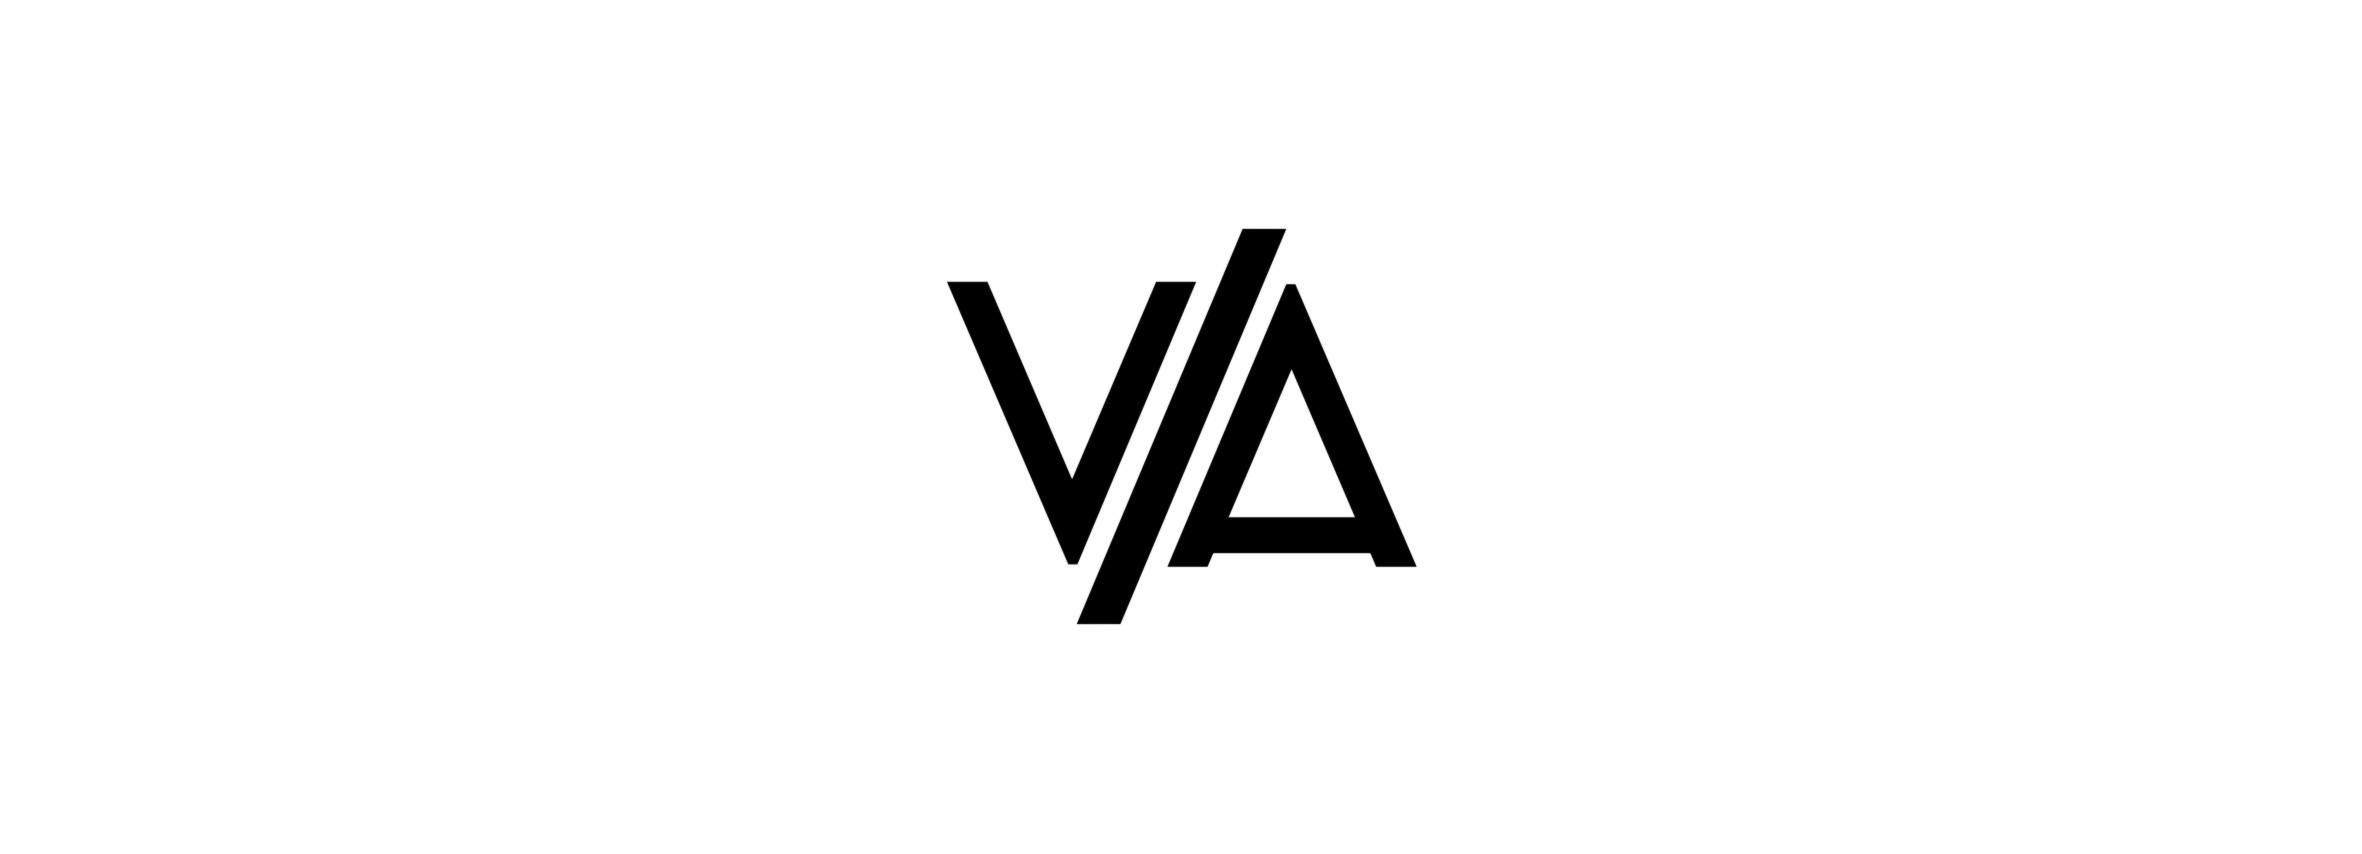 VA logo..